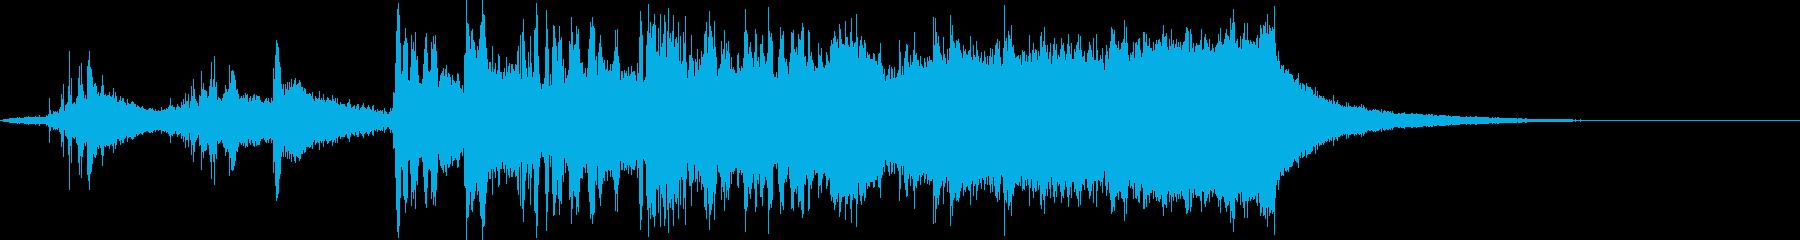 CINEMATIC RISER_35の再生済みの波形